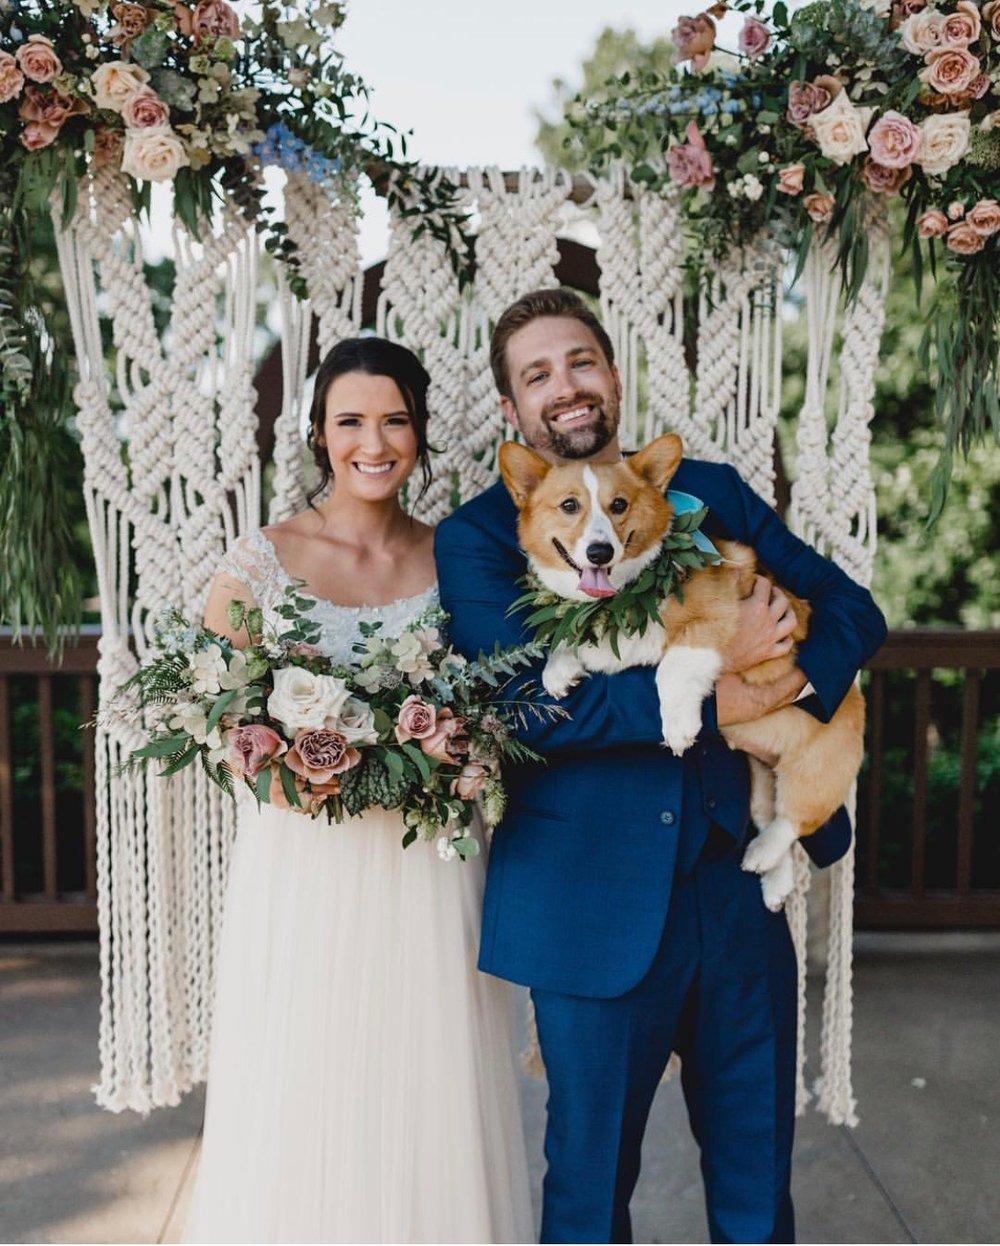 Tulsa wedding macrame backdrop.jpg